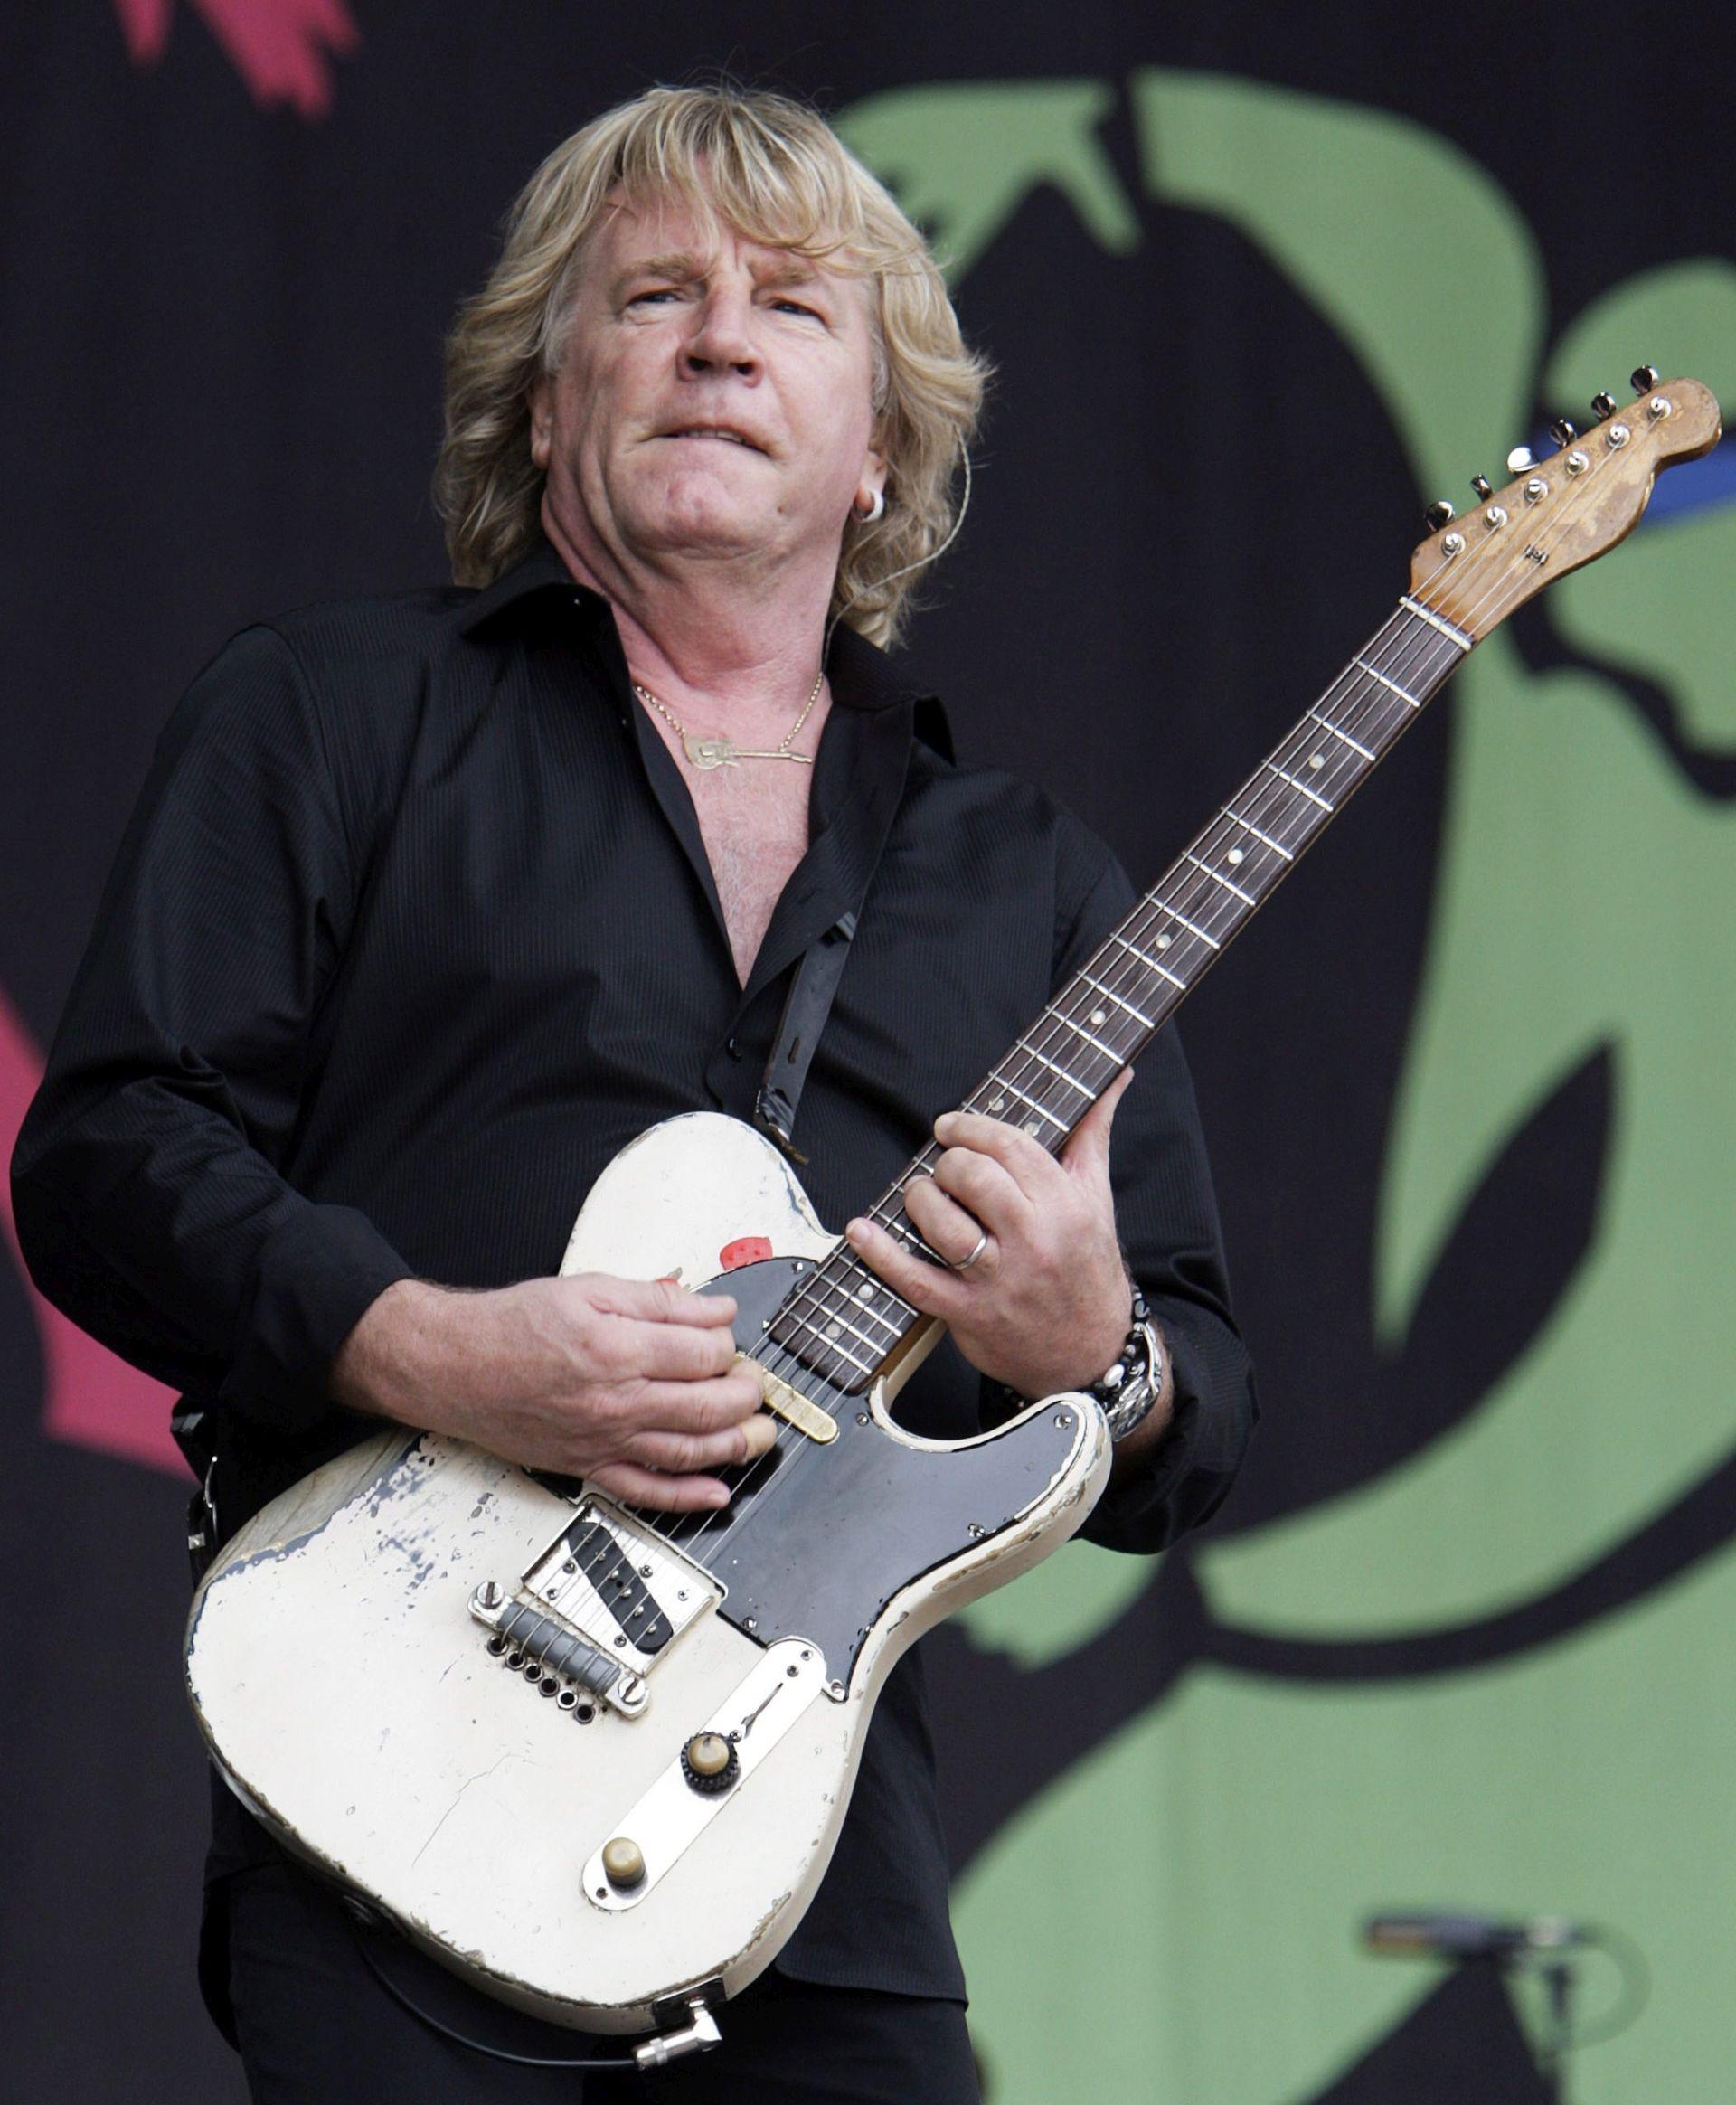 Umro Rick Parfitt, gitarist grupe Status Quo